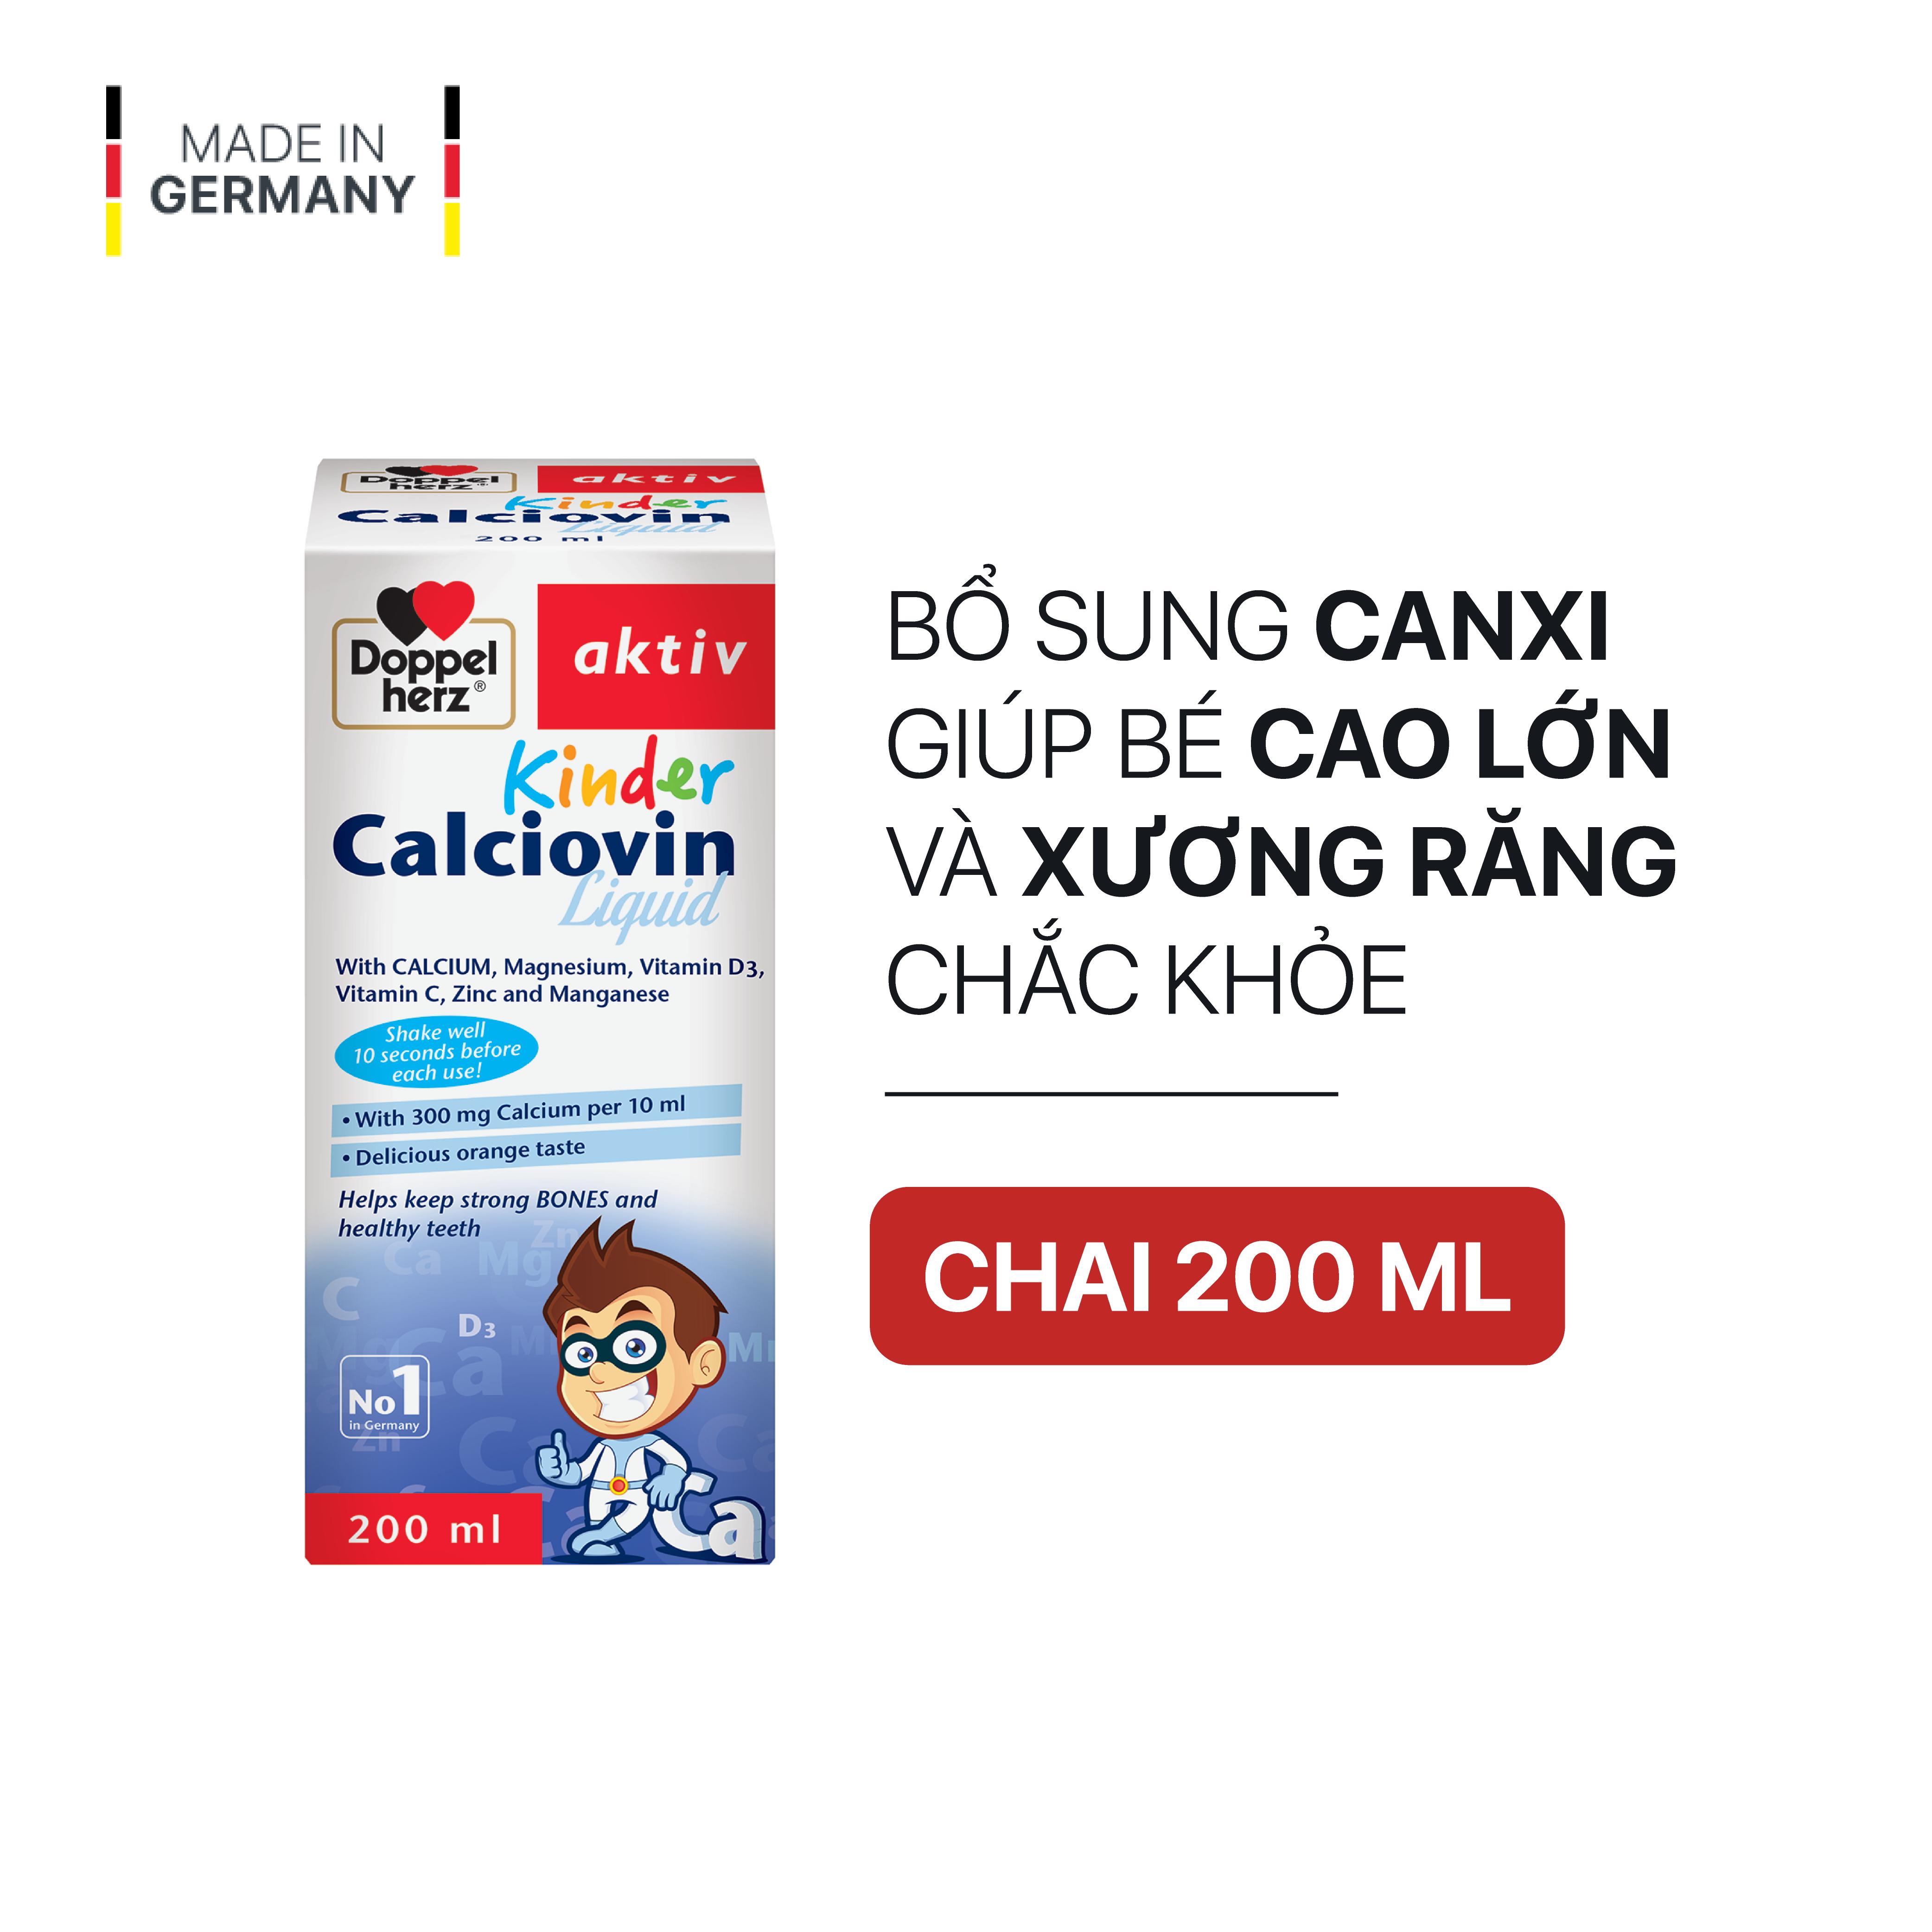 Siro bổ sung Canxi hữu cơ dành cho bé Doppelherz Aktiv Kinder Calciovin Liquid (Chai 200ml)